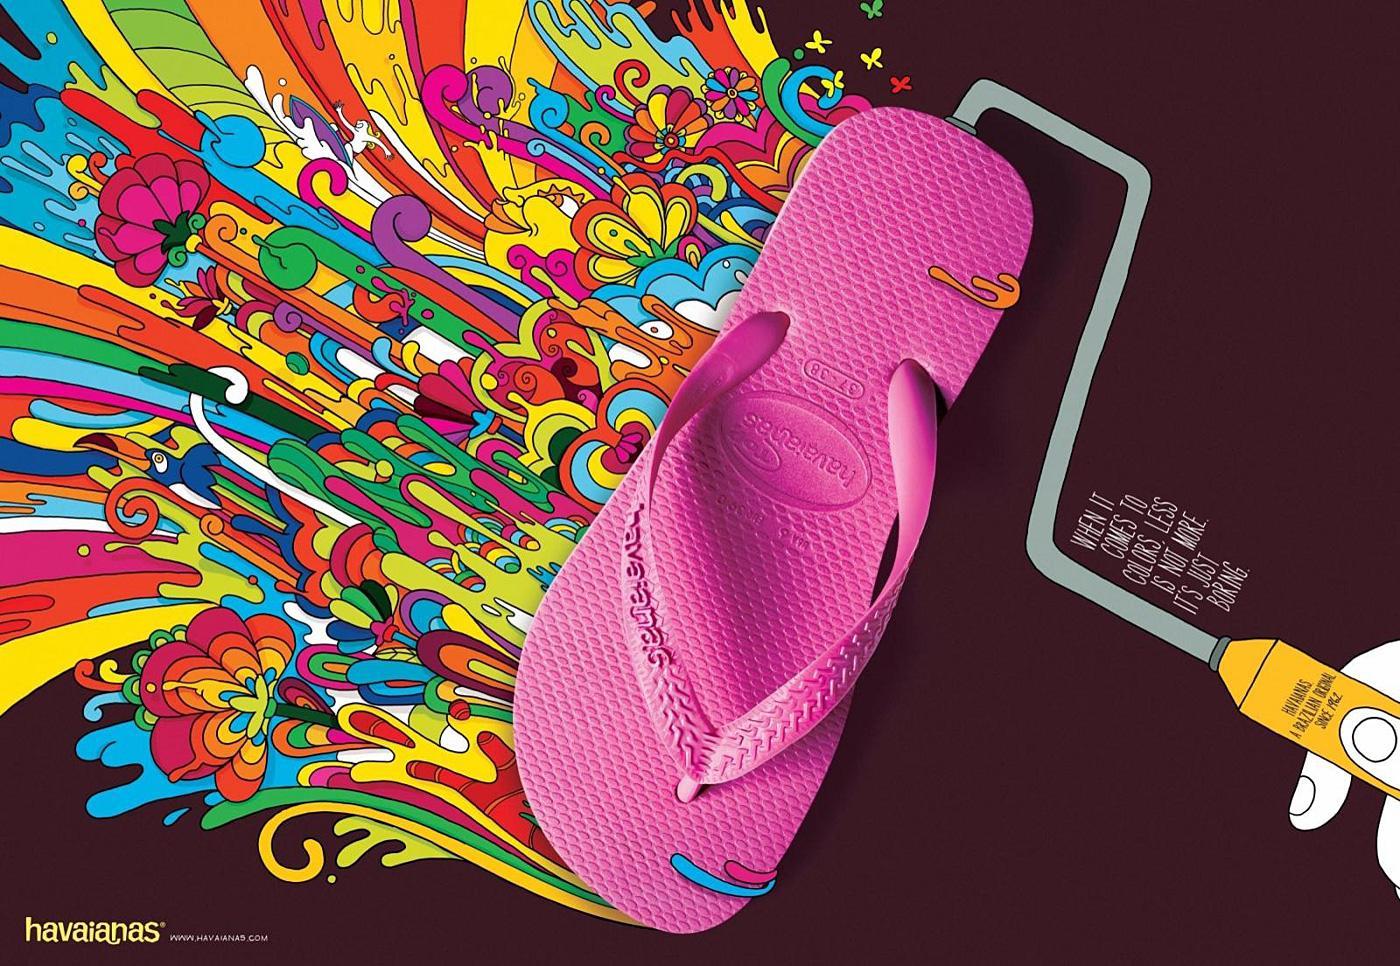 havaianas-sandals-crank